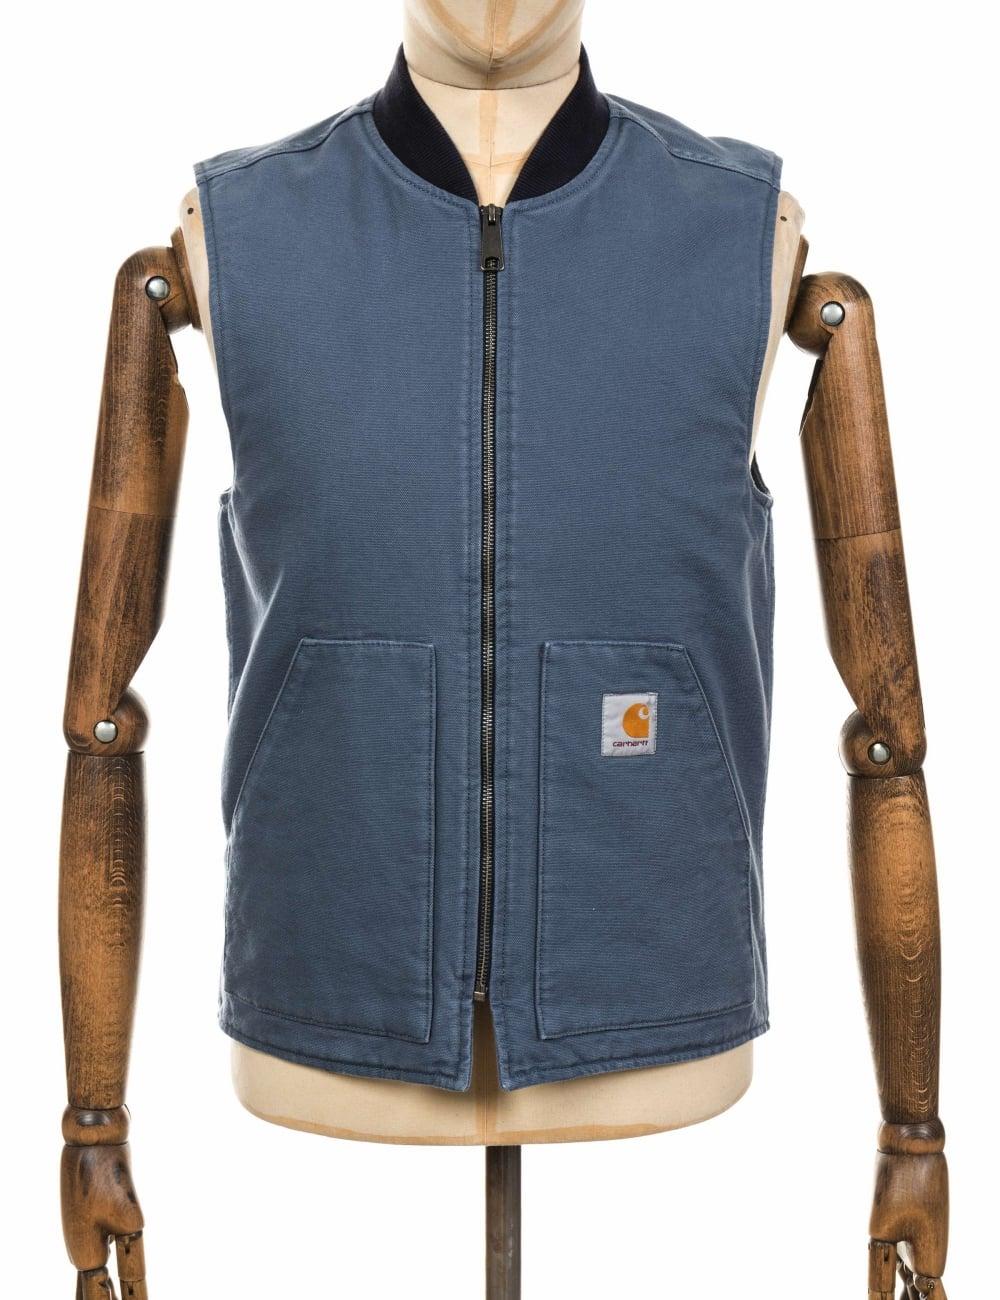 410e74afbb4 Carhartt WIP Vest - Stone Blue - Clothing from Fat Buddha Store UK carhartt  uk returns